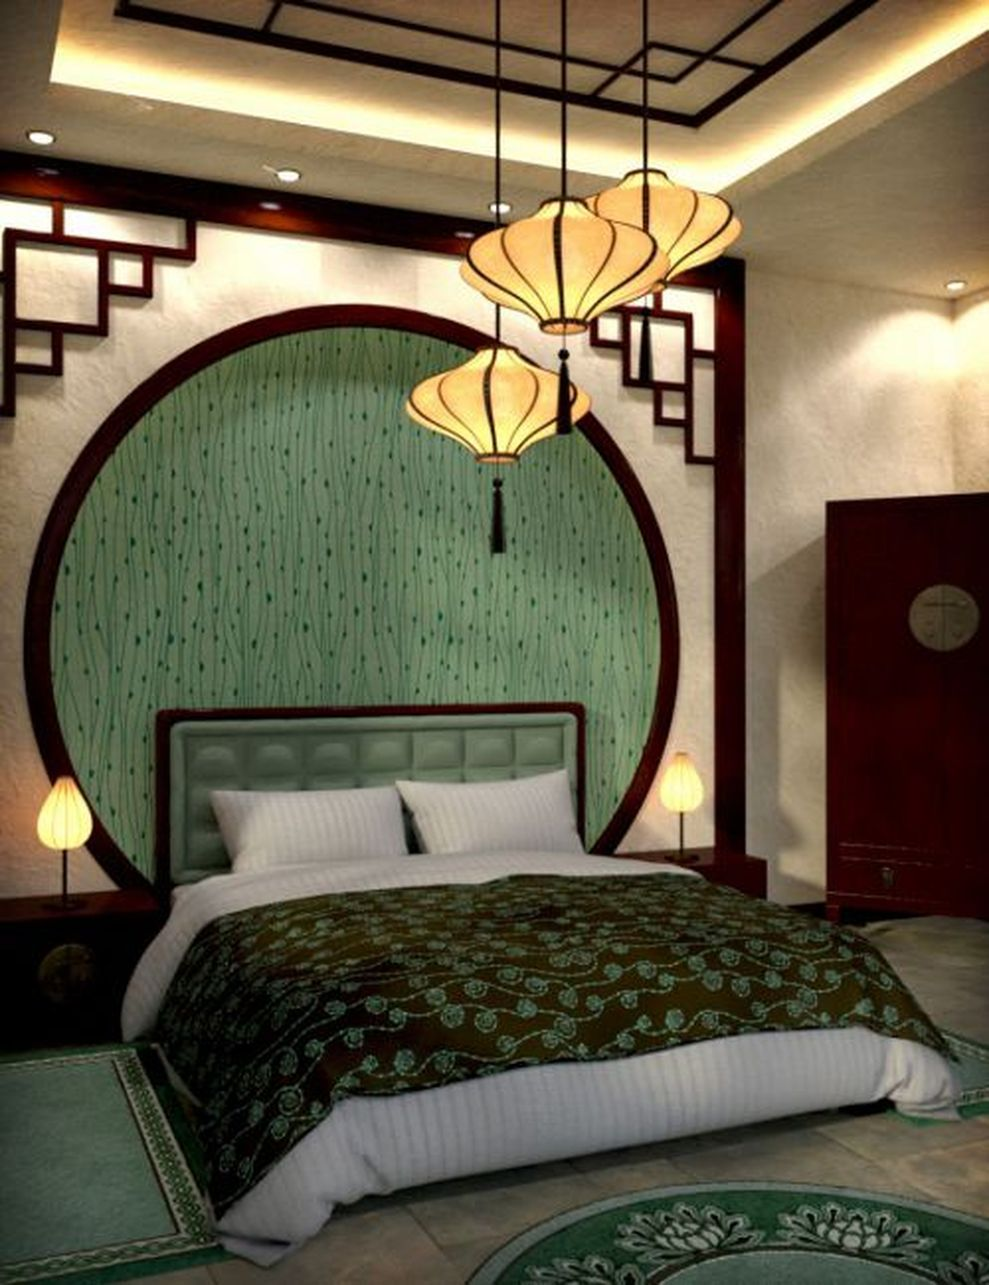 80 Cute Bedroom Design Ideas Pink Green Walls Home Decor Asian Interior Inspired